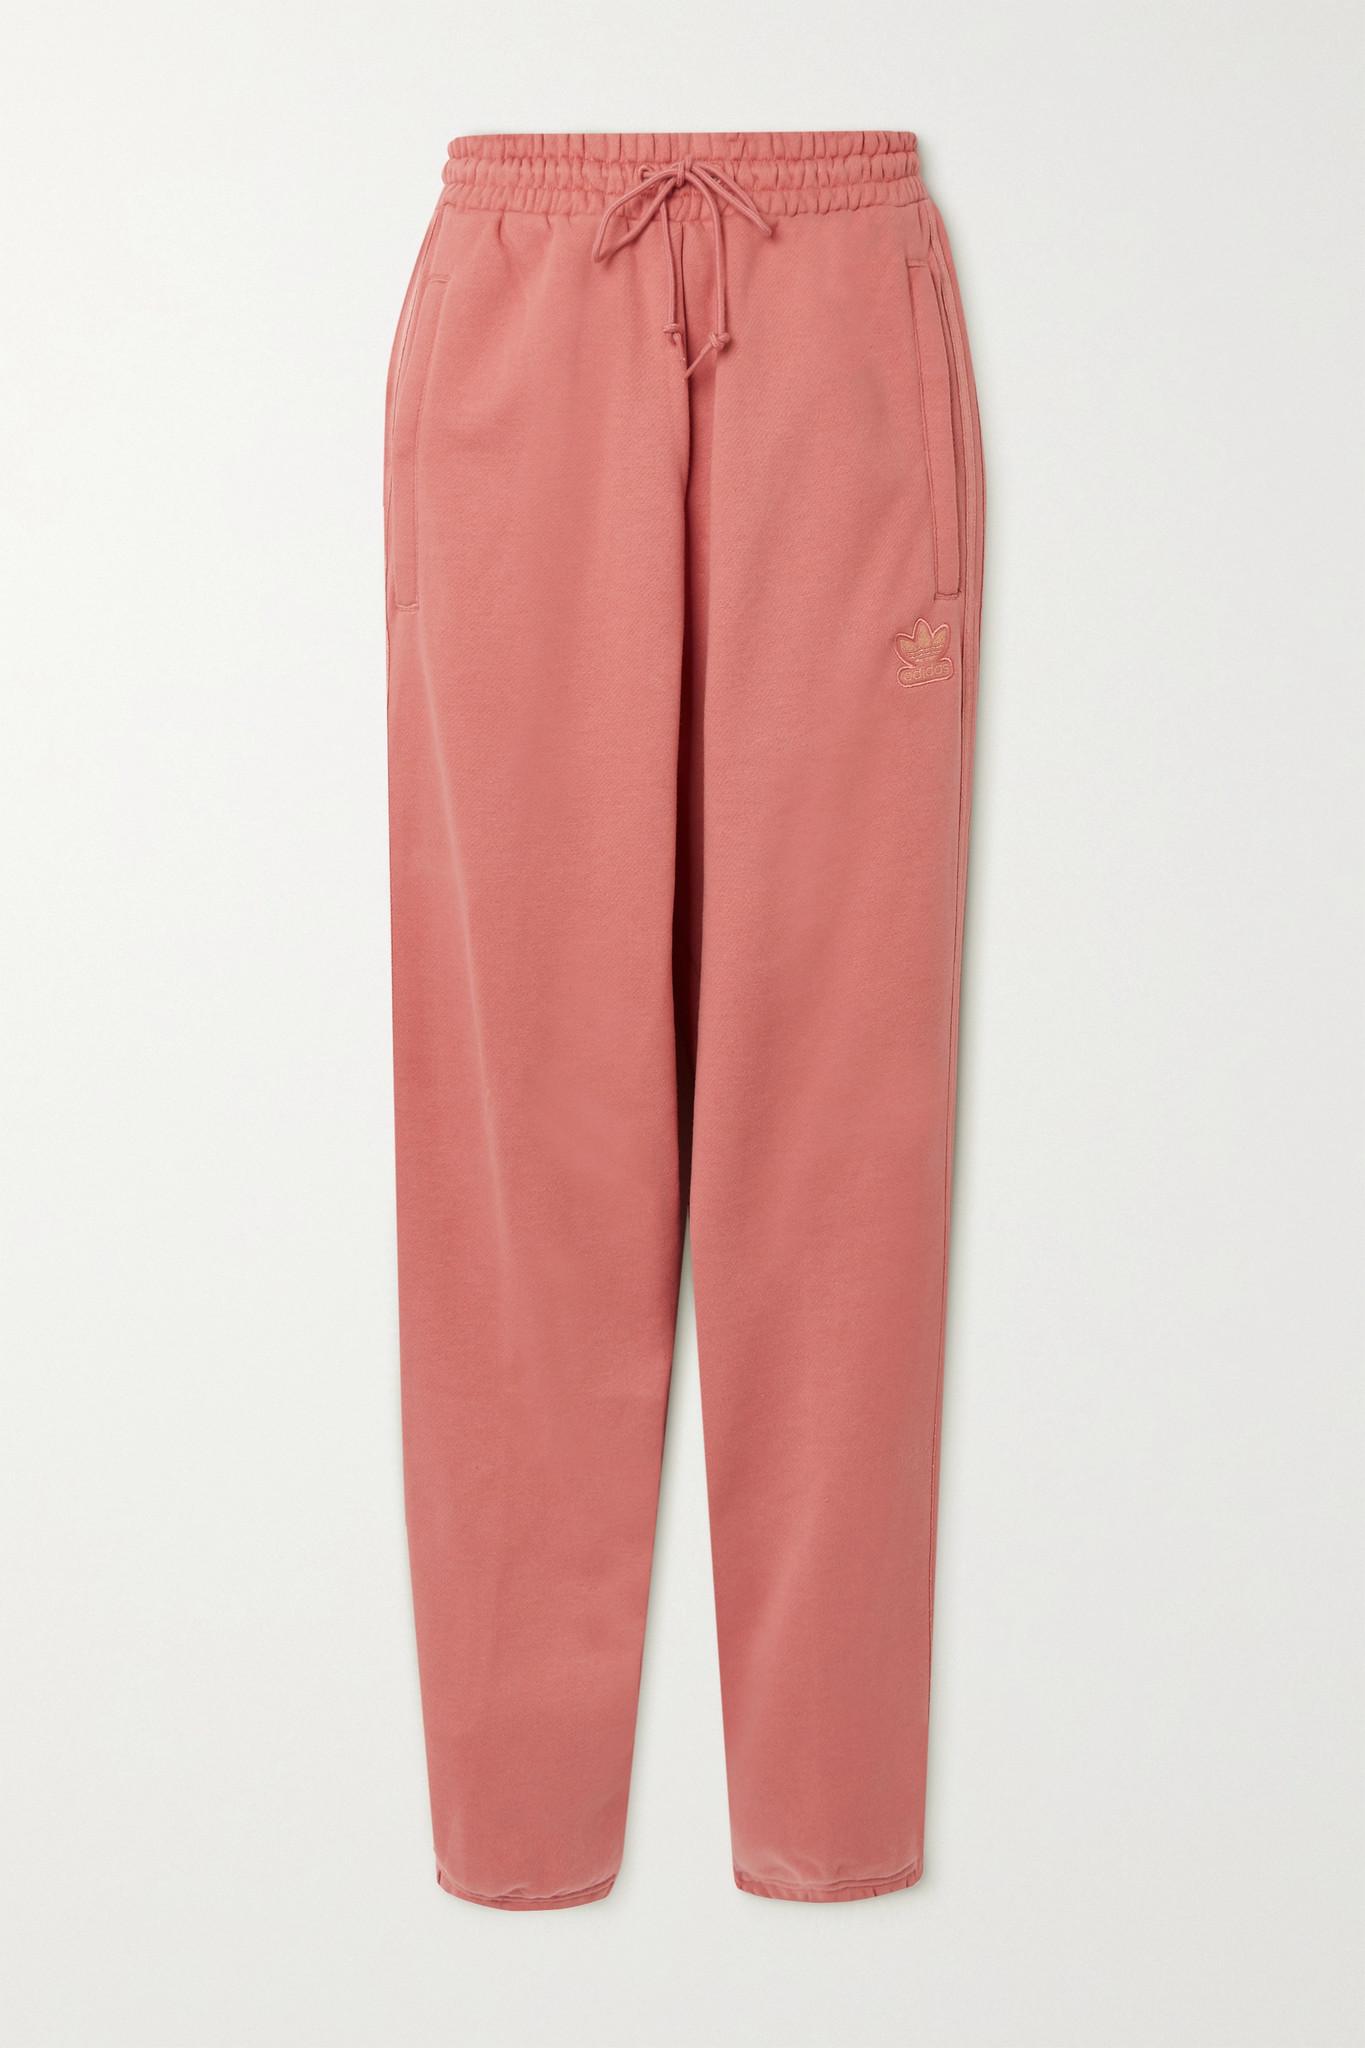 ADIDAS ORIGINALS - 金属感条纹法国纯棉毛巾布运动裤 - 粉红色 - UK6